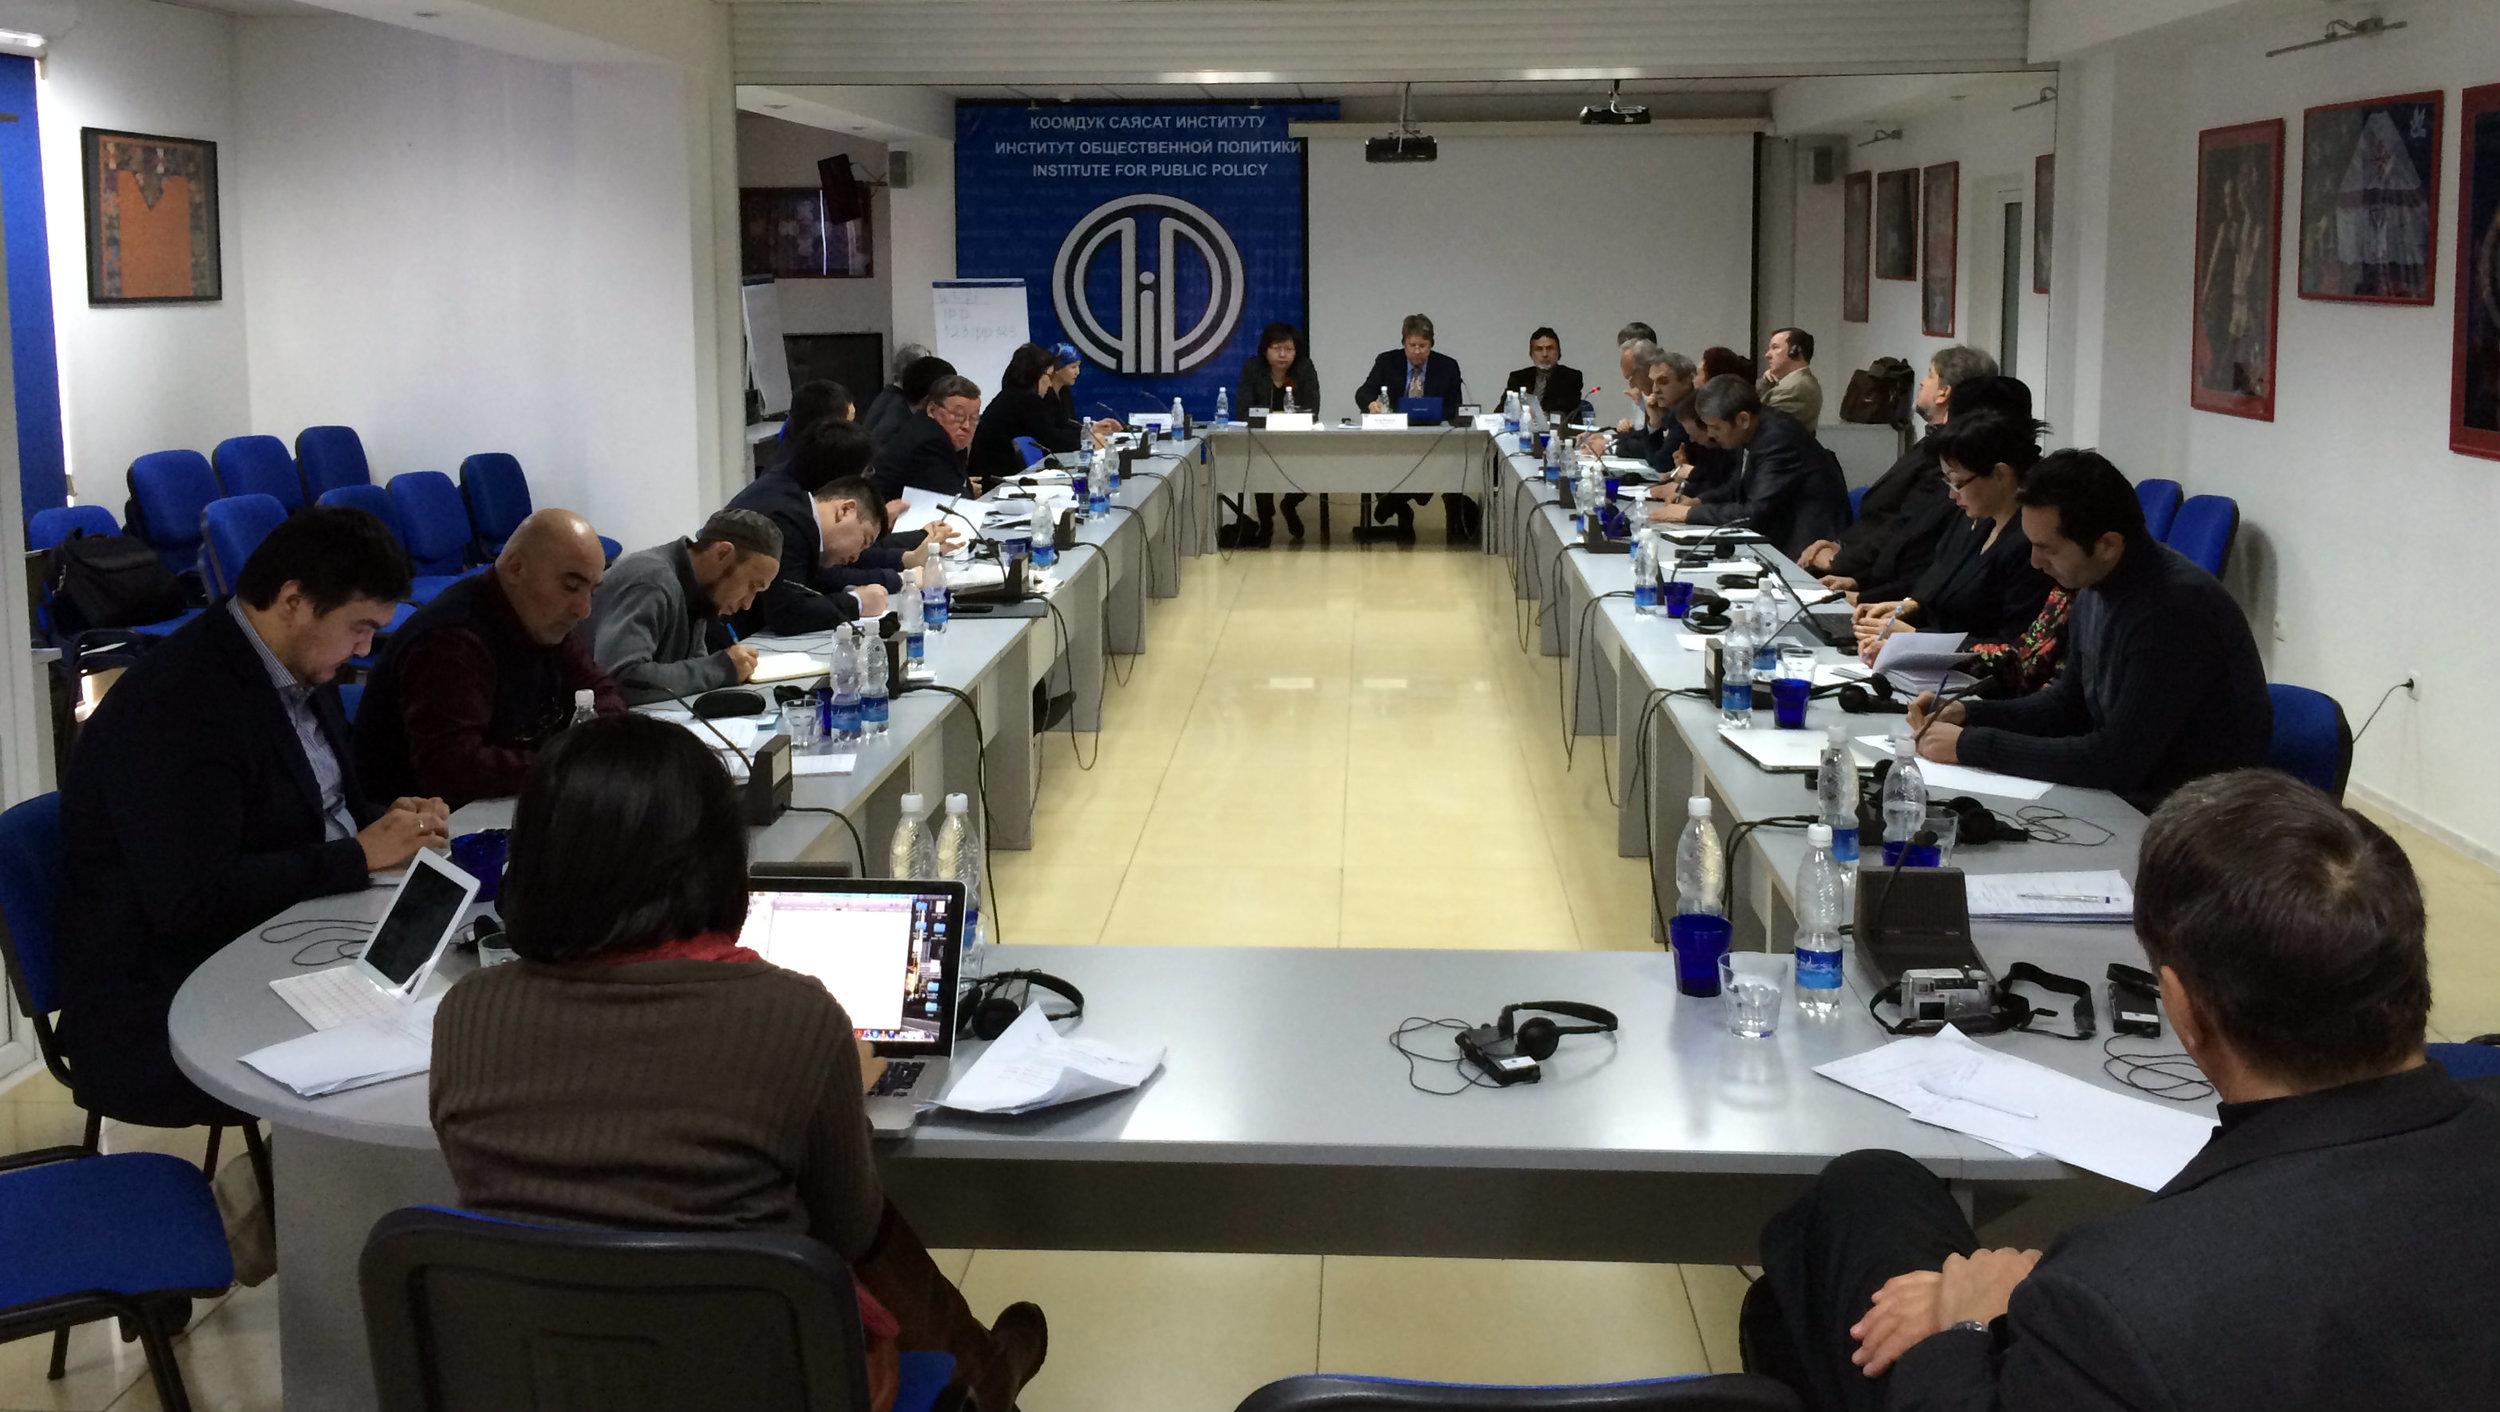 bishkek conference.jpg